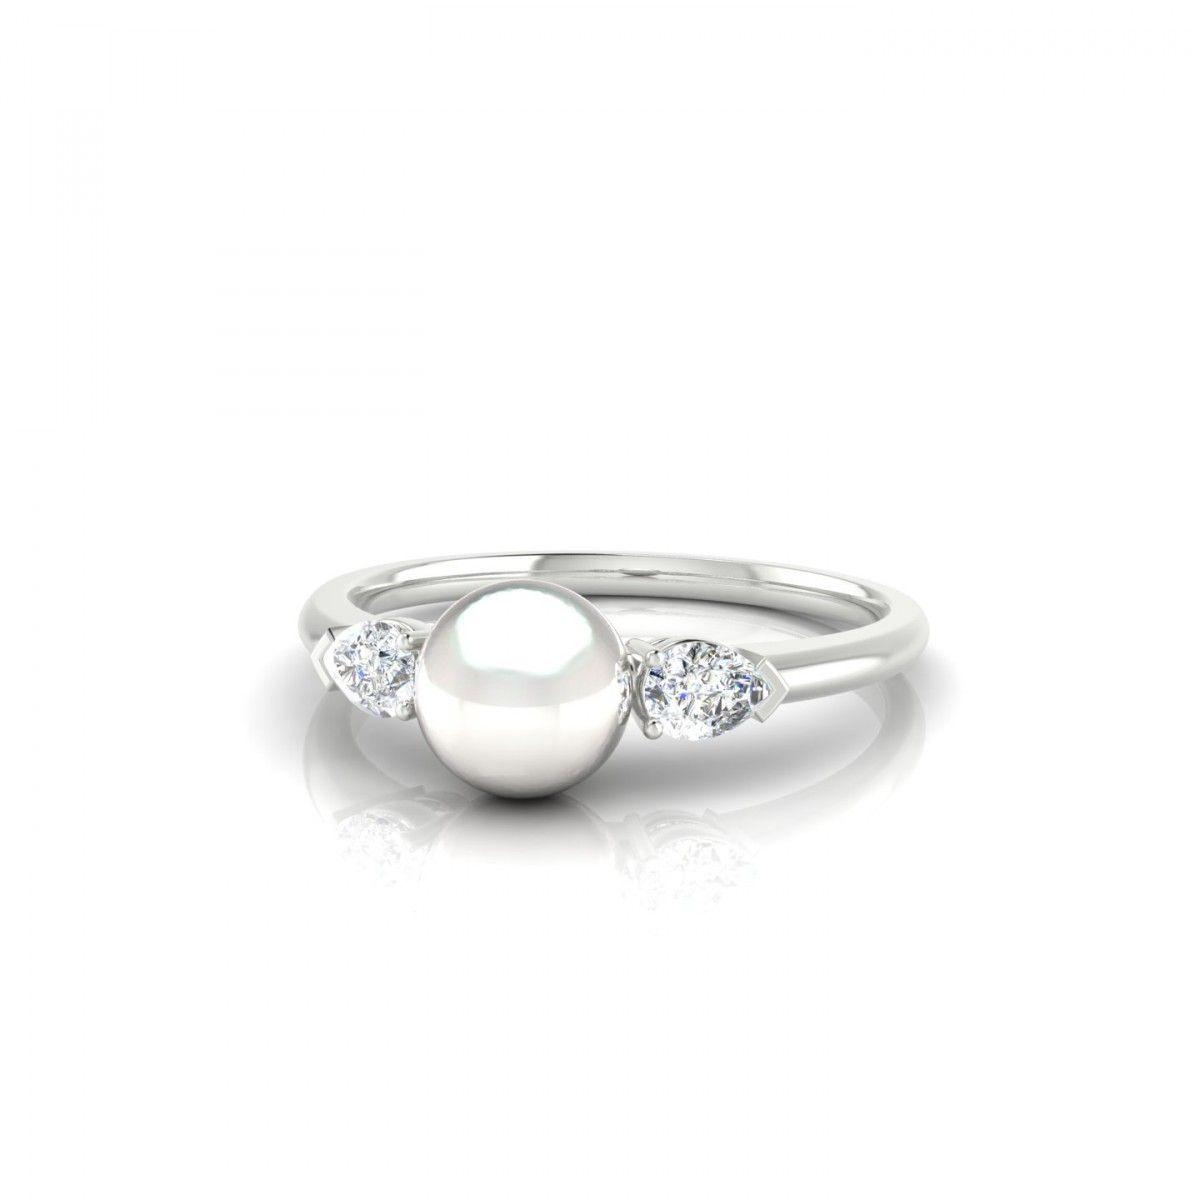 670e01ad750 Orama Bague Perle d eau douce blanche en Or blanc